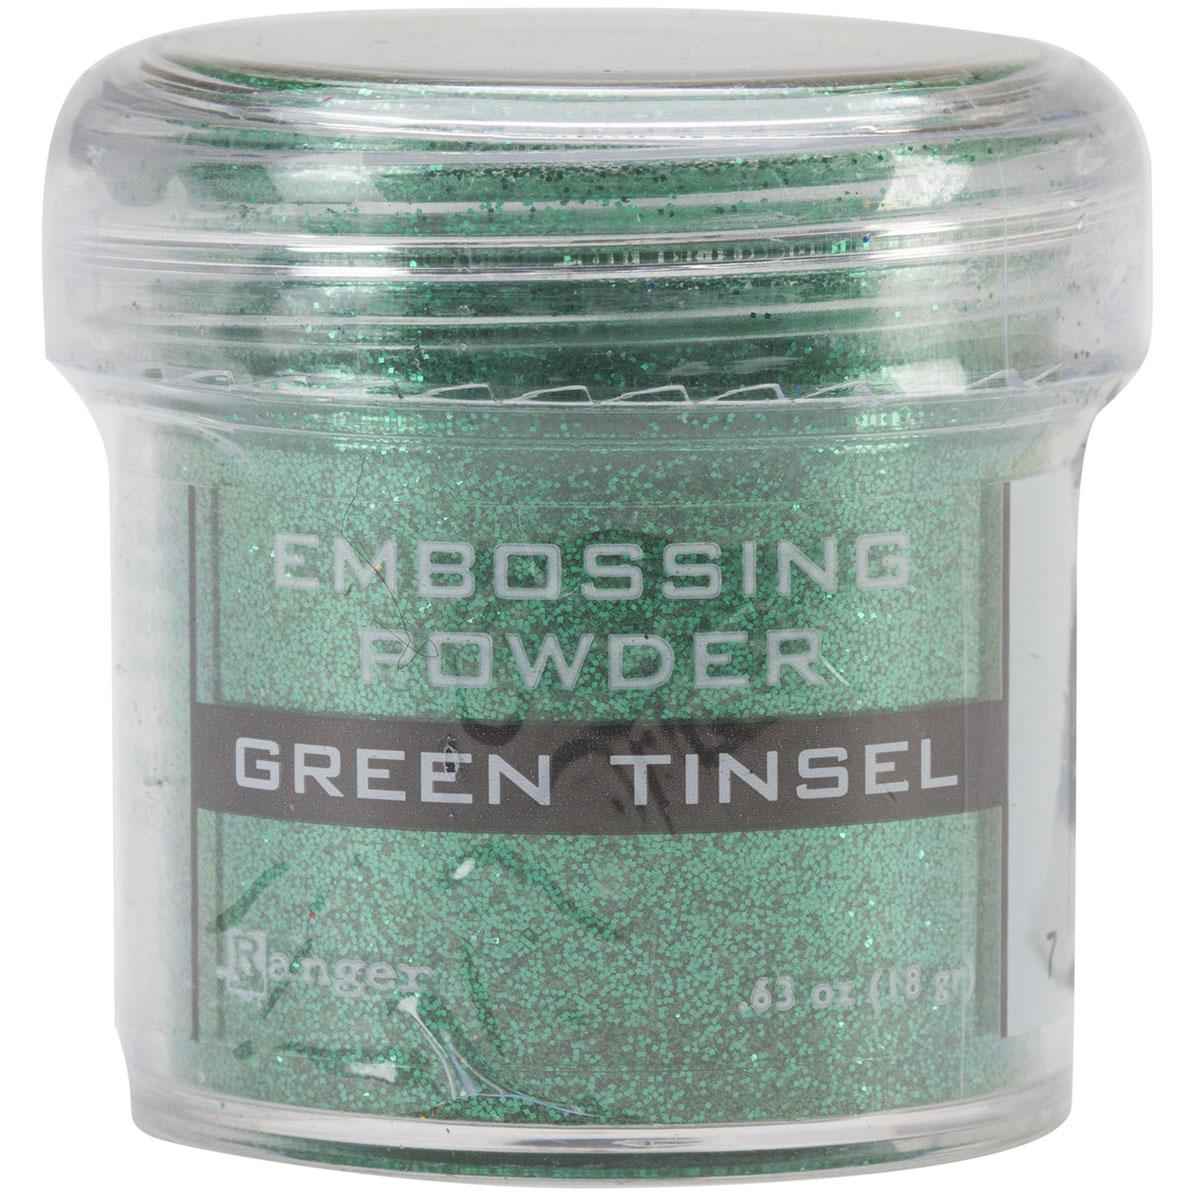 EMBOSSING POWDER- GREEN TINSEL